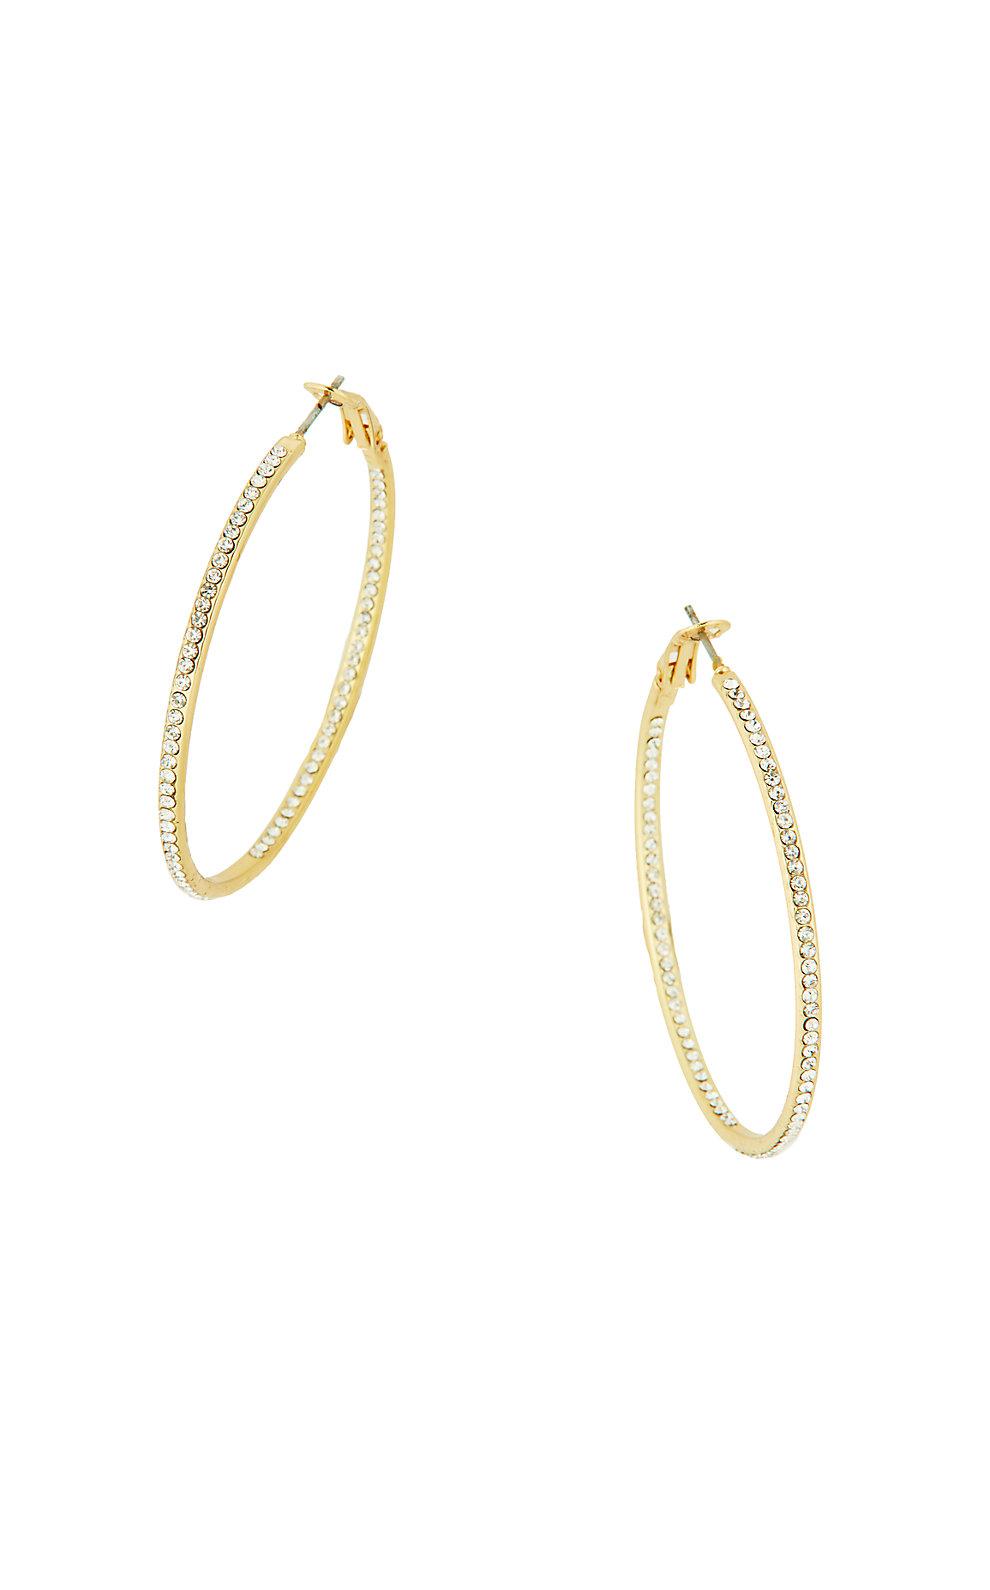 Lilly Pulitzer Stardust Hoop Earrings